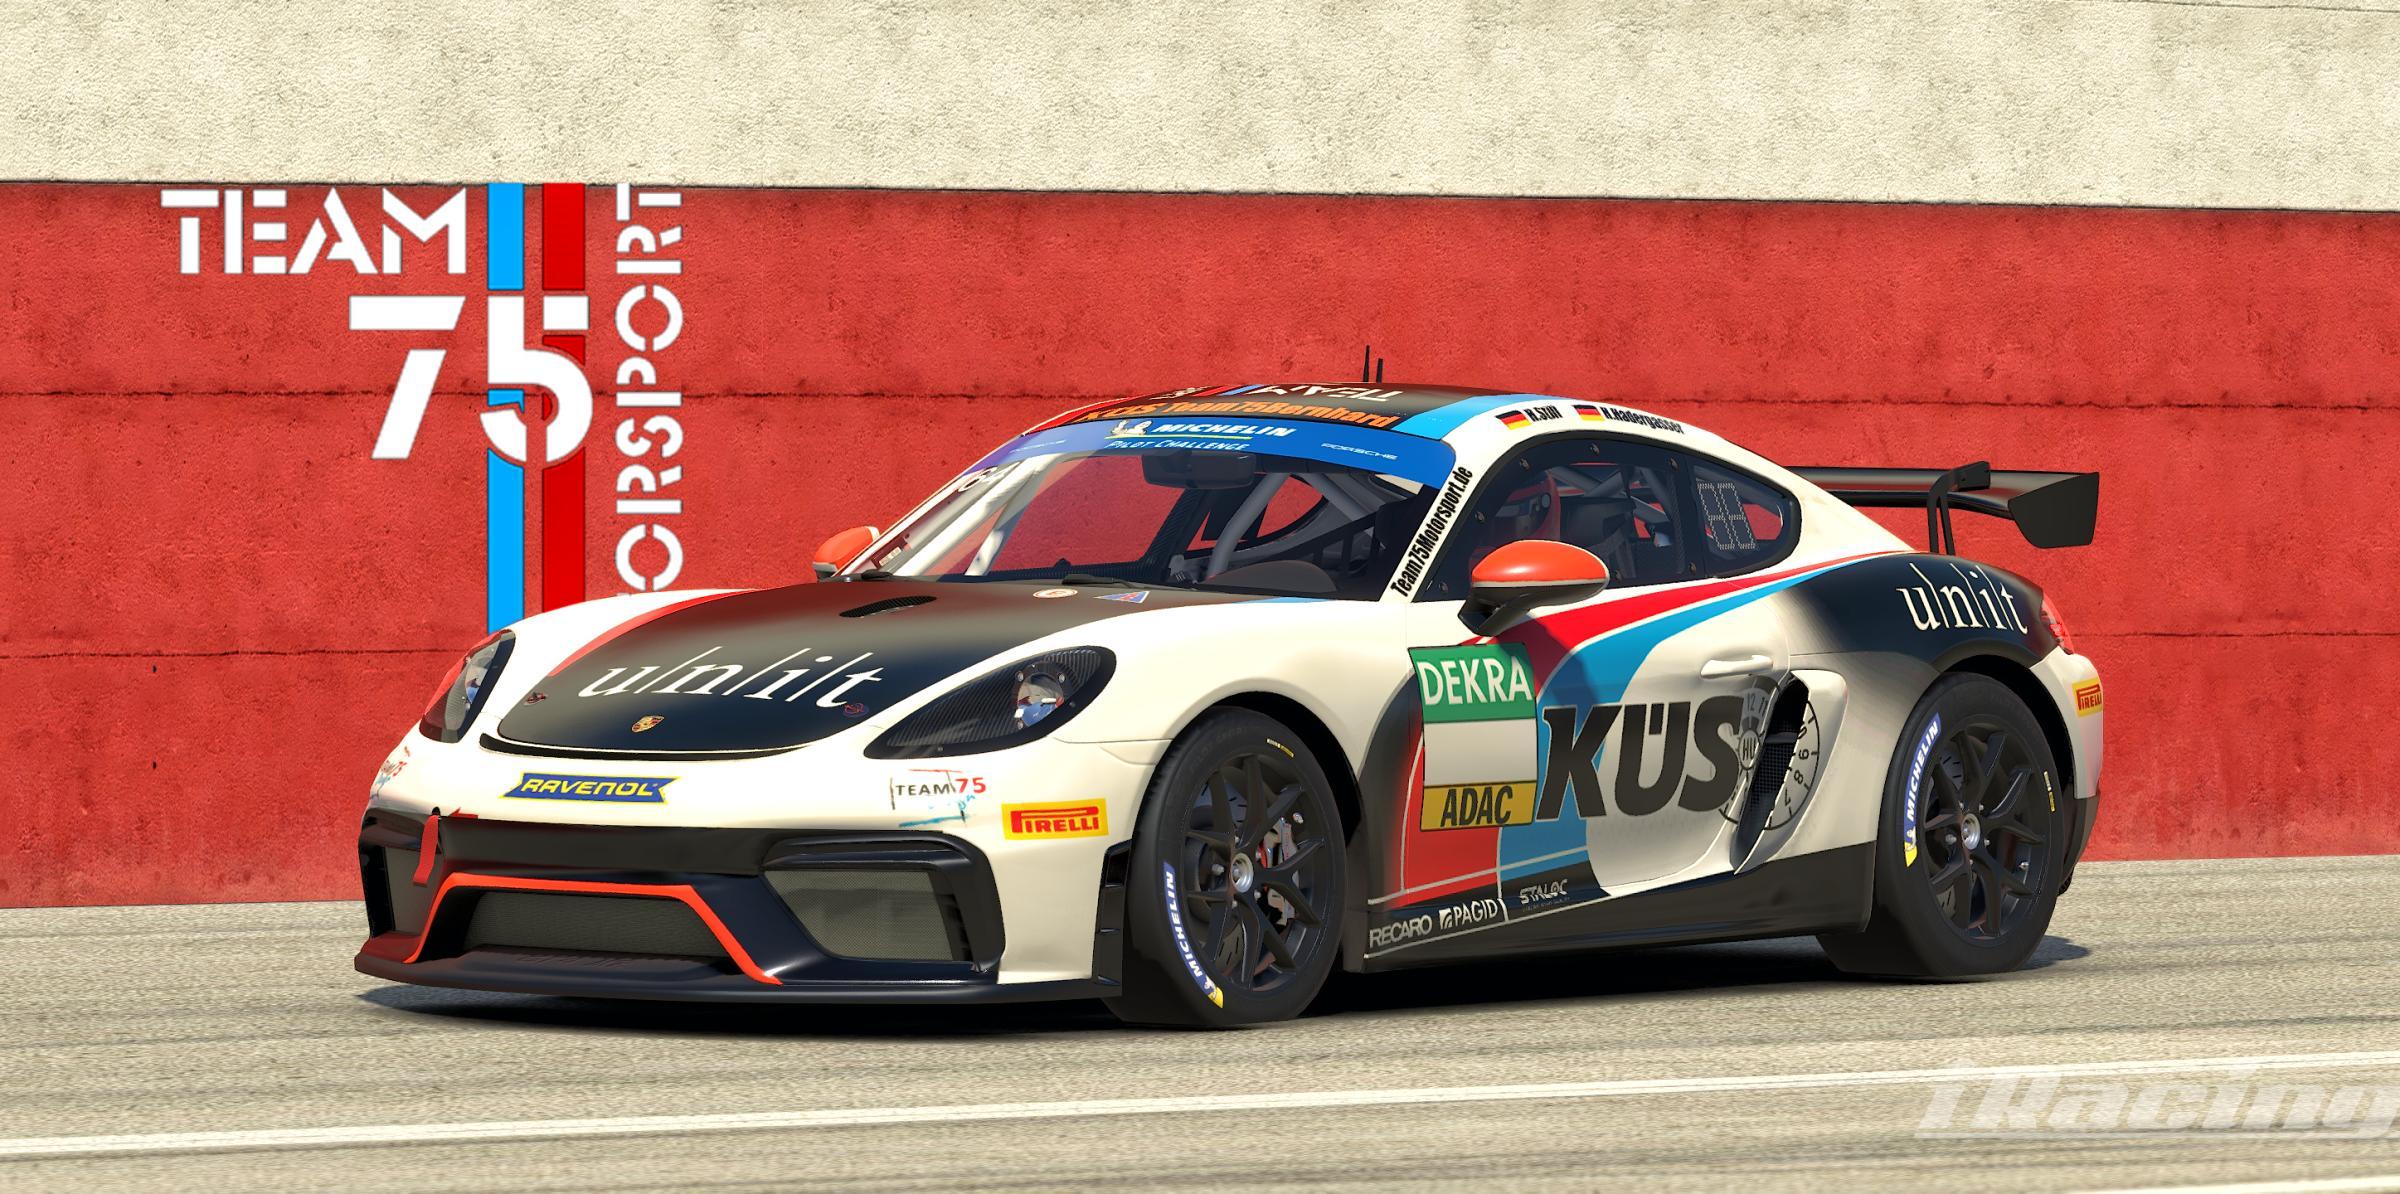 Preview of Team 75 KÜS Motorsport  by Stefan Gawlista